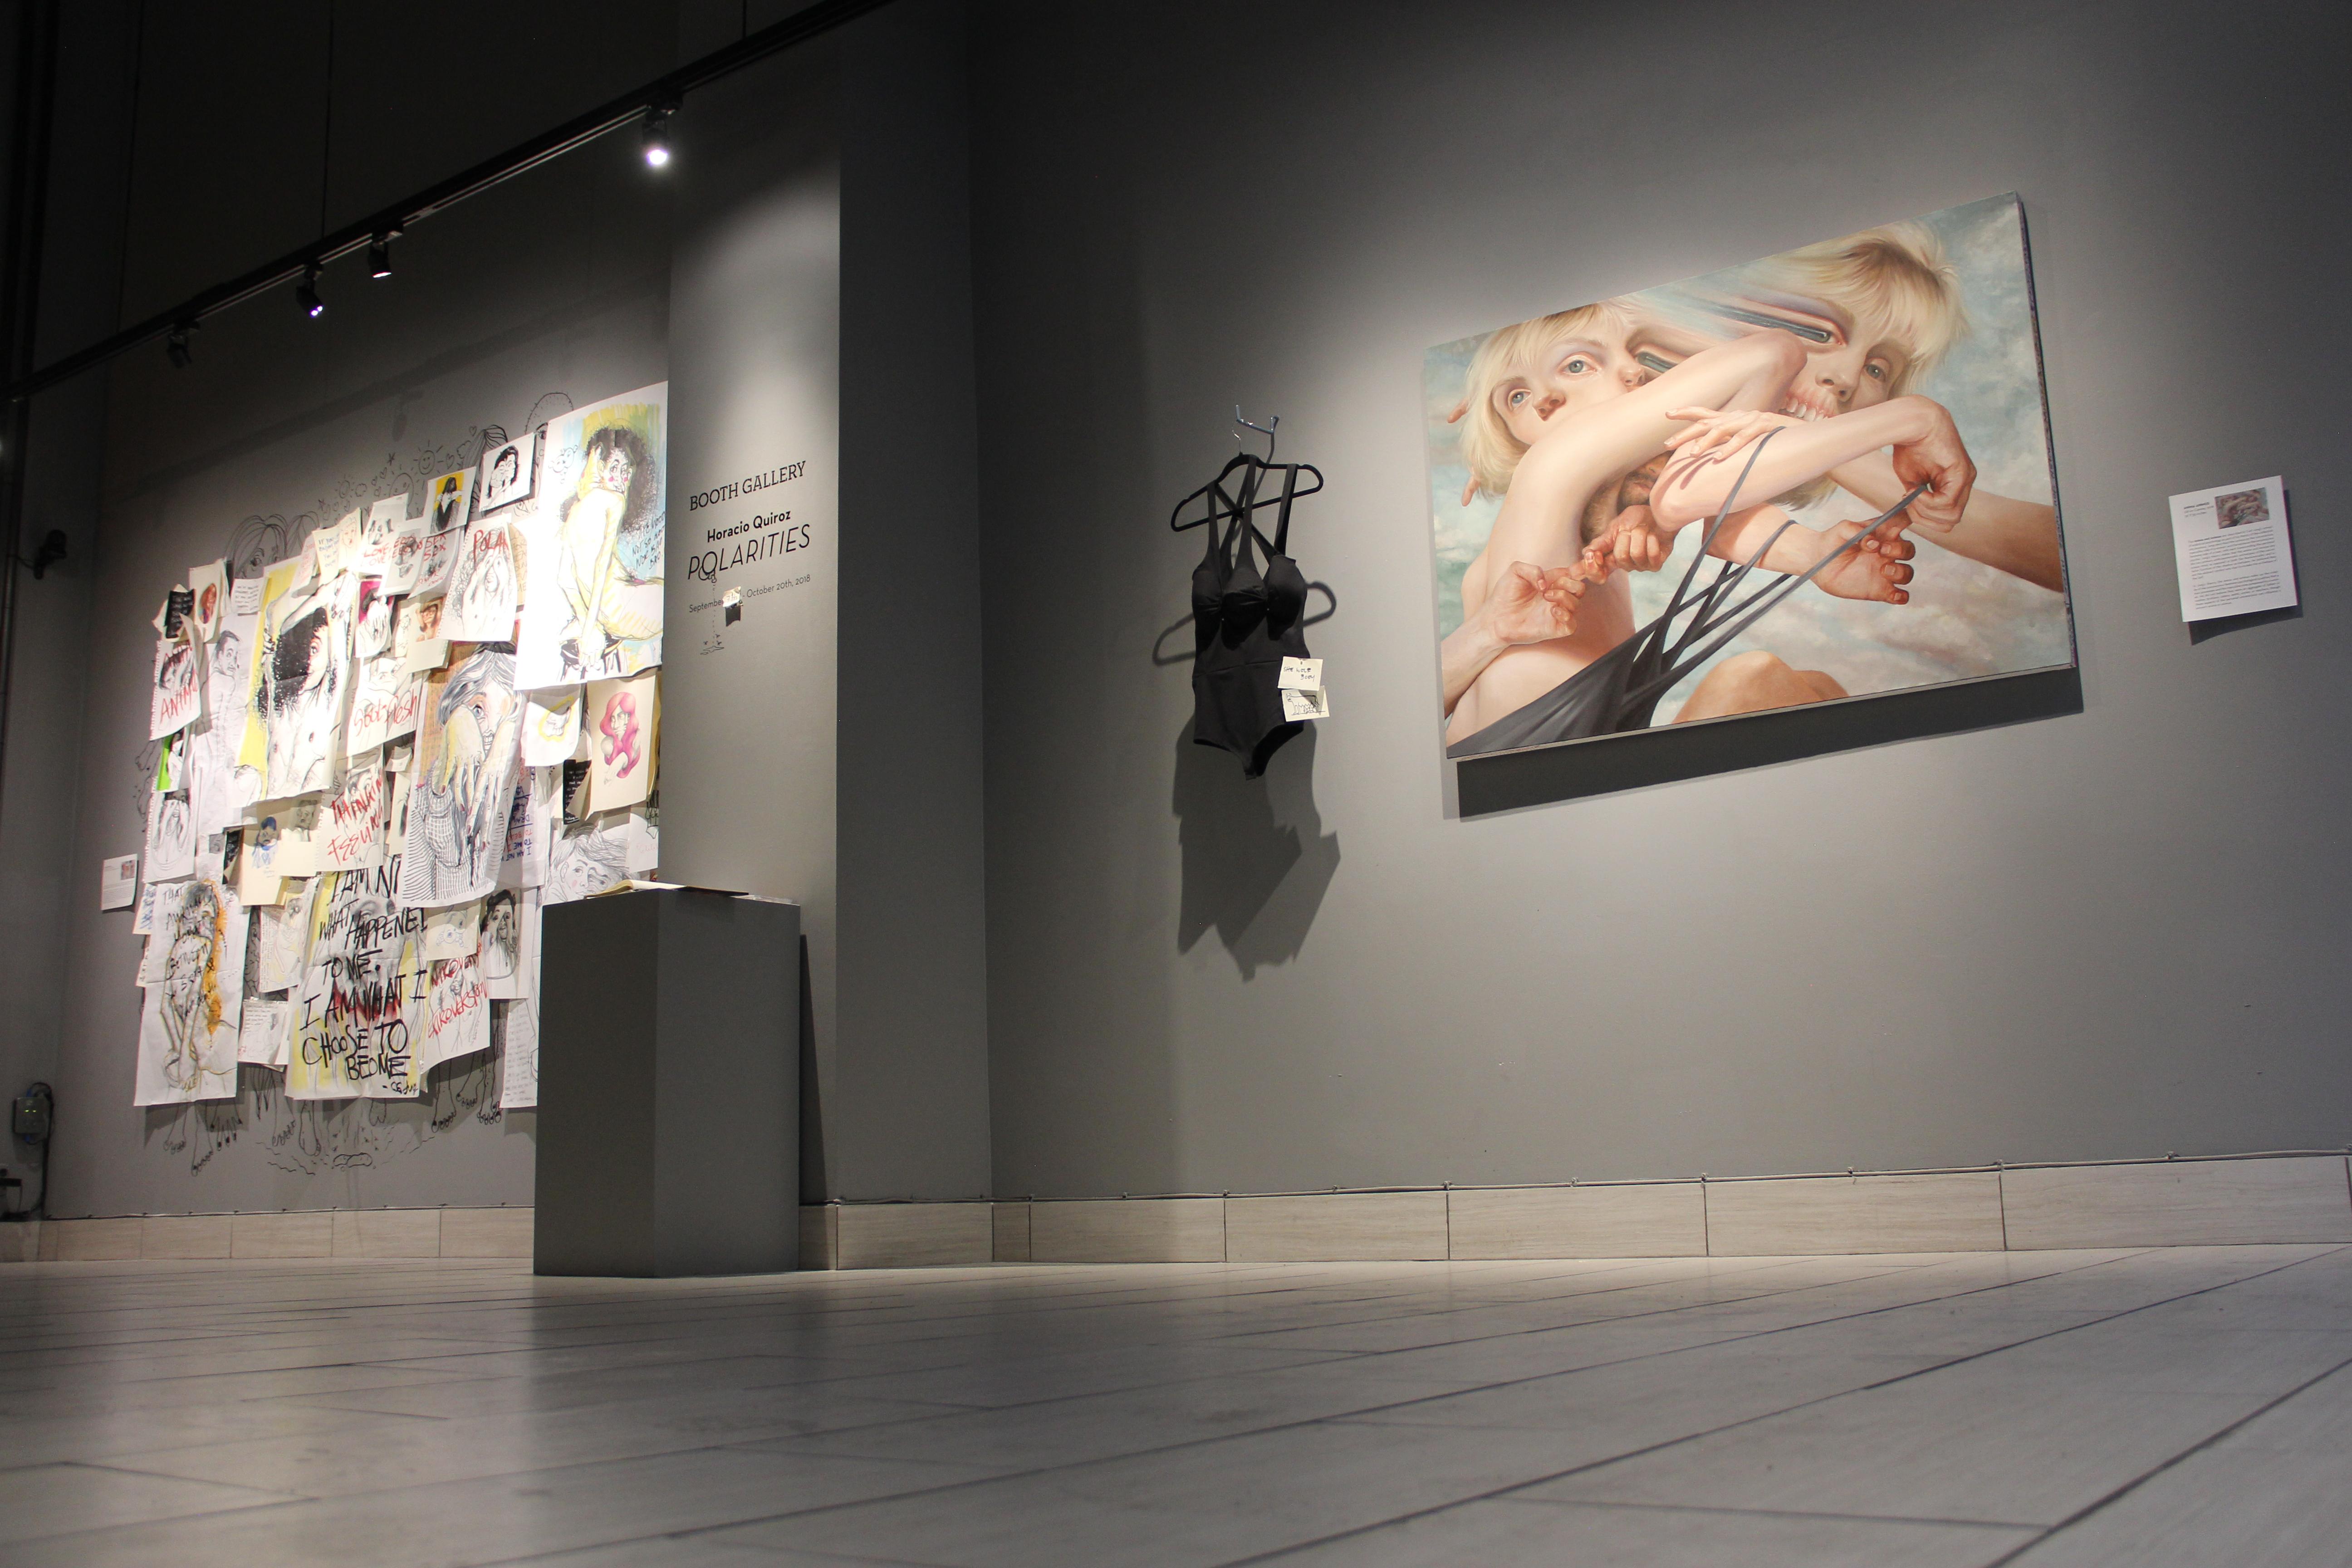 Horacio Quiroz Polarities Booth Gallery Myartisreal Interview, art show new york city